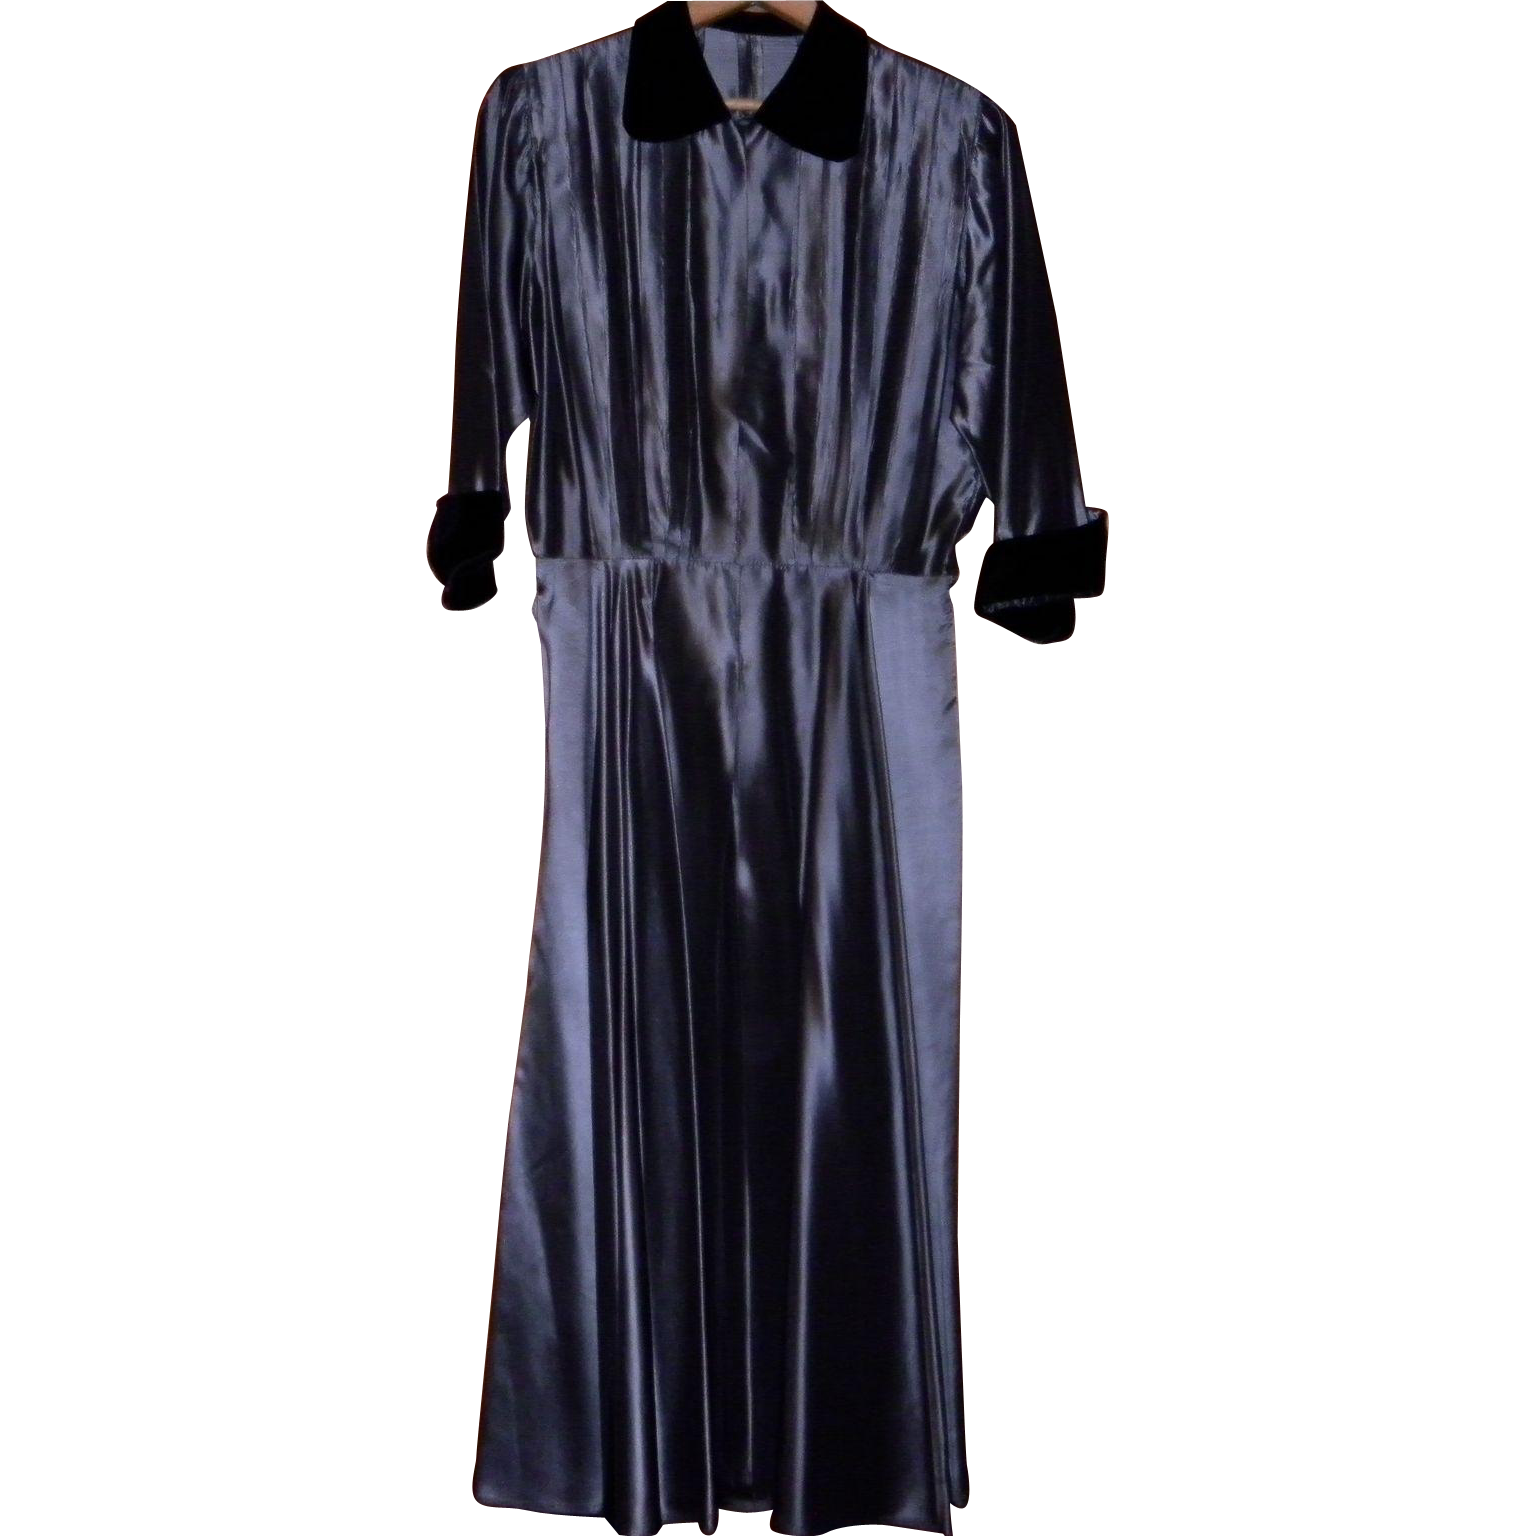 Vintage 1950's Taffeta Dress Size Small / XS